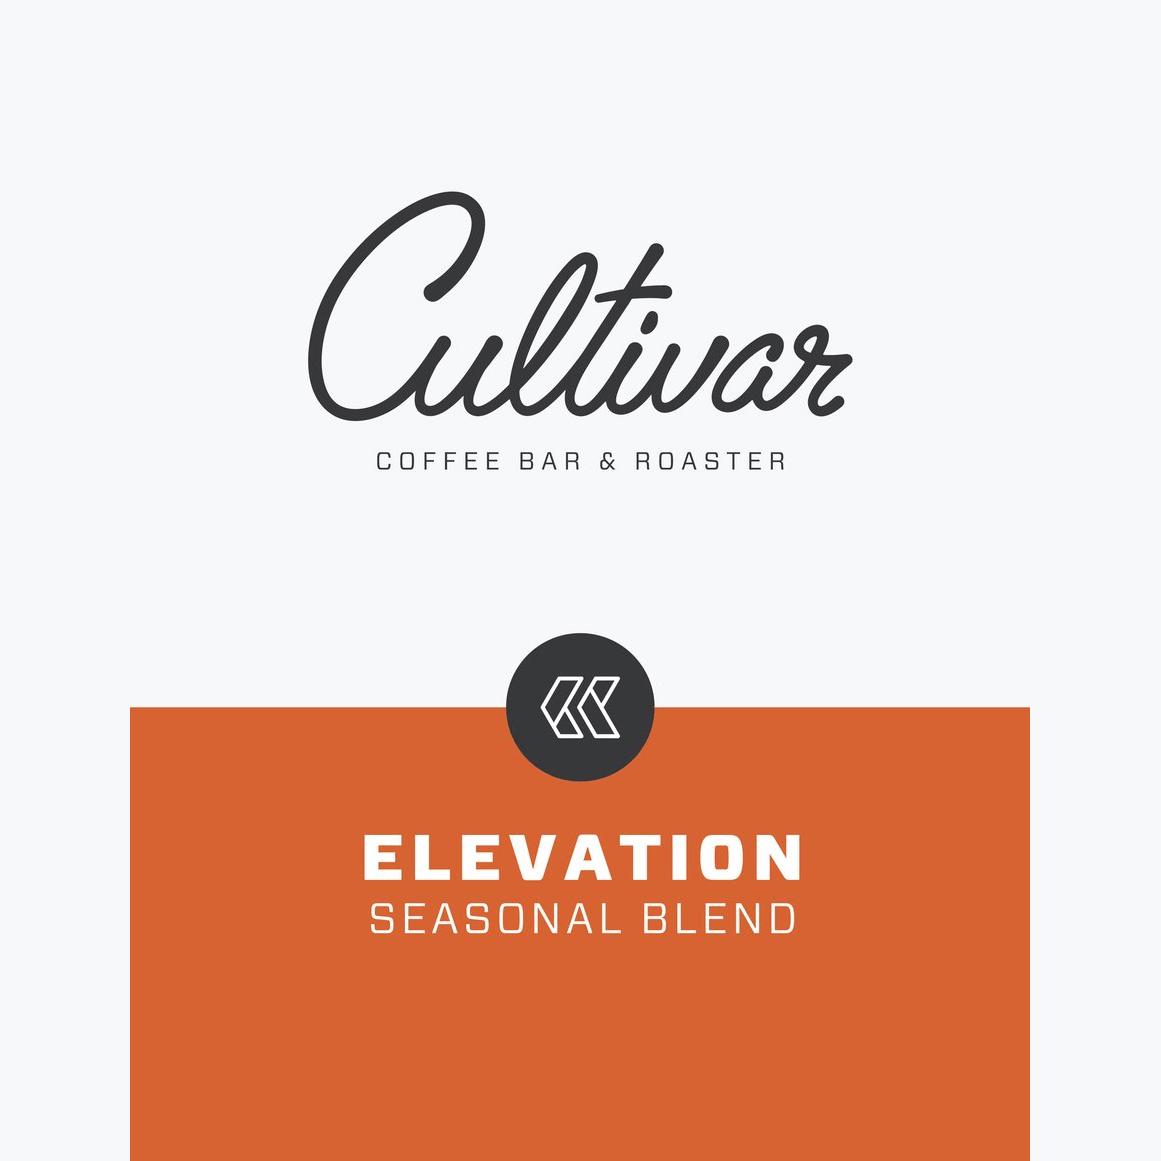 Elevation Seasonal Blend from Cultivar Coffee Roasting Co.